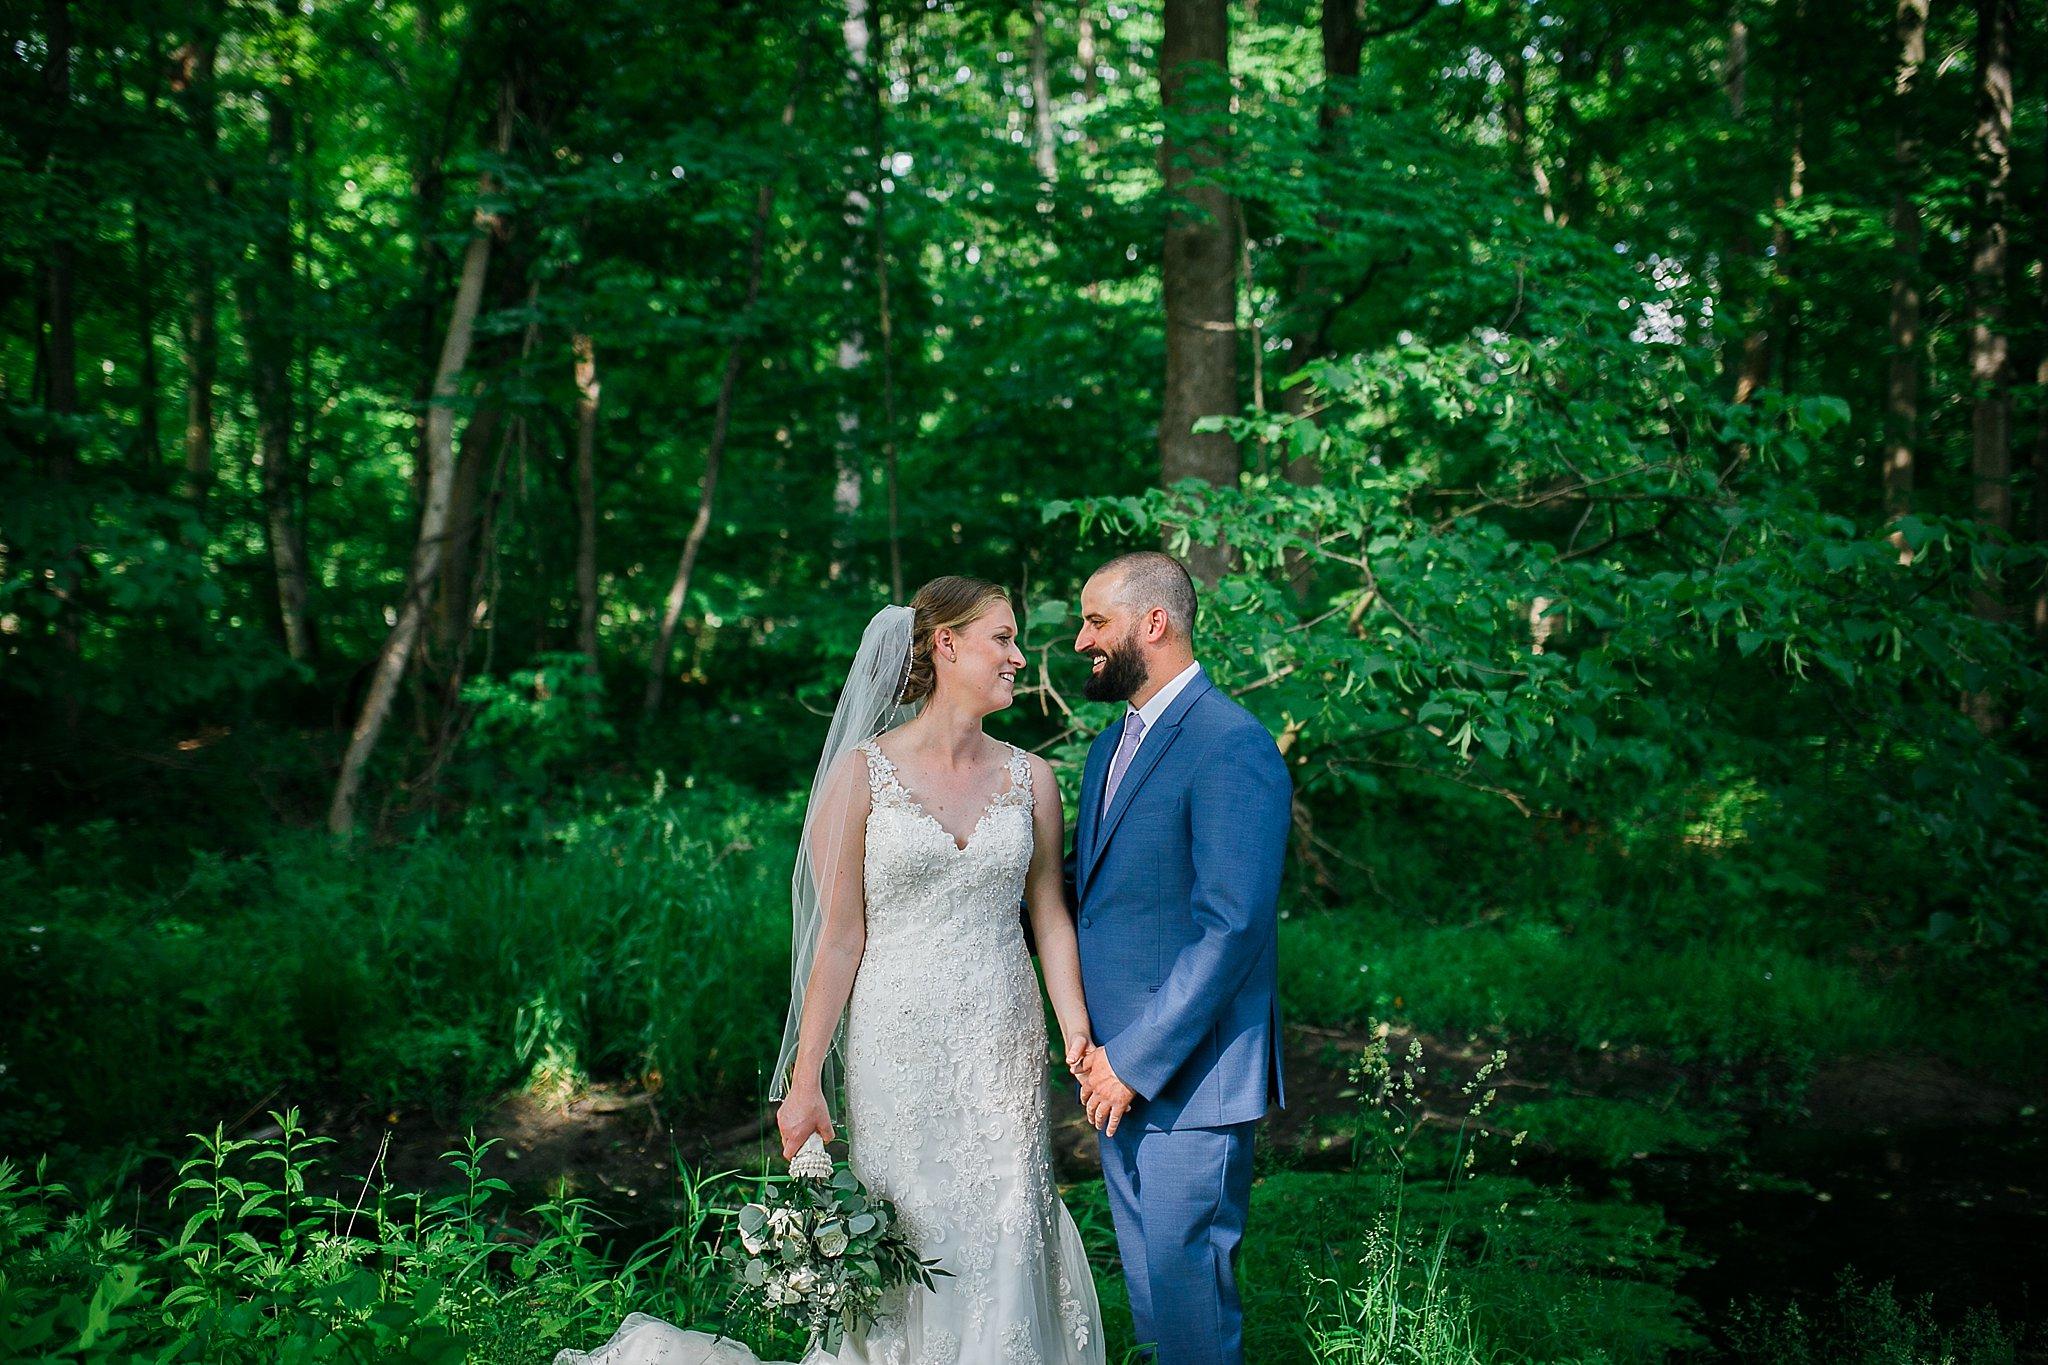 Hollow Brook Golf Club Cortlandt Manor NY Wedding Sweet Alice Photography June Wedding56.jpg